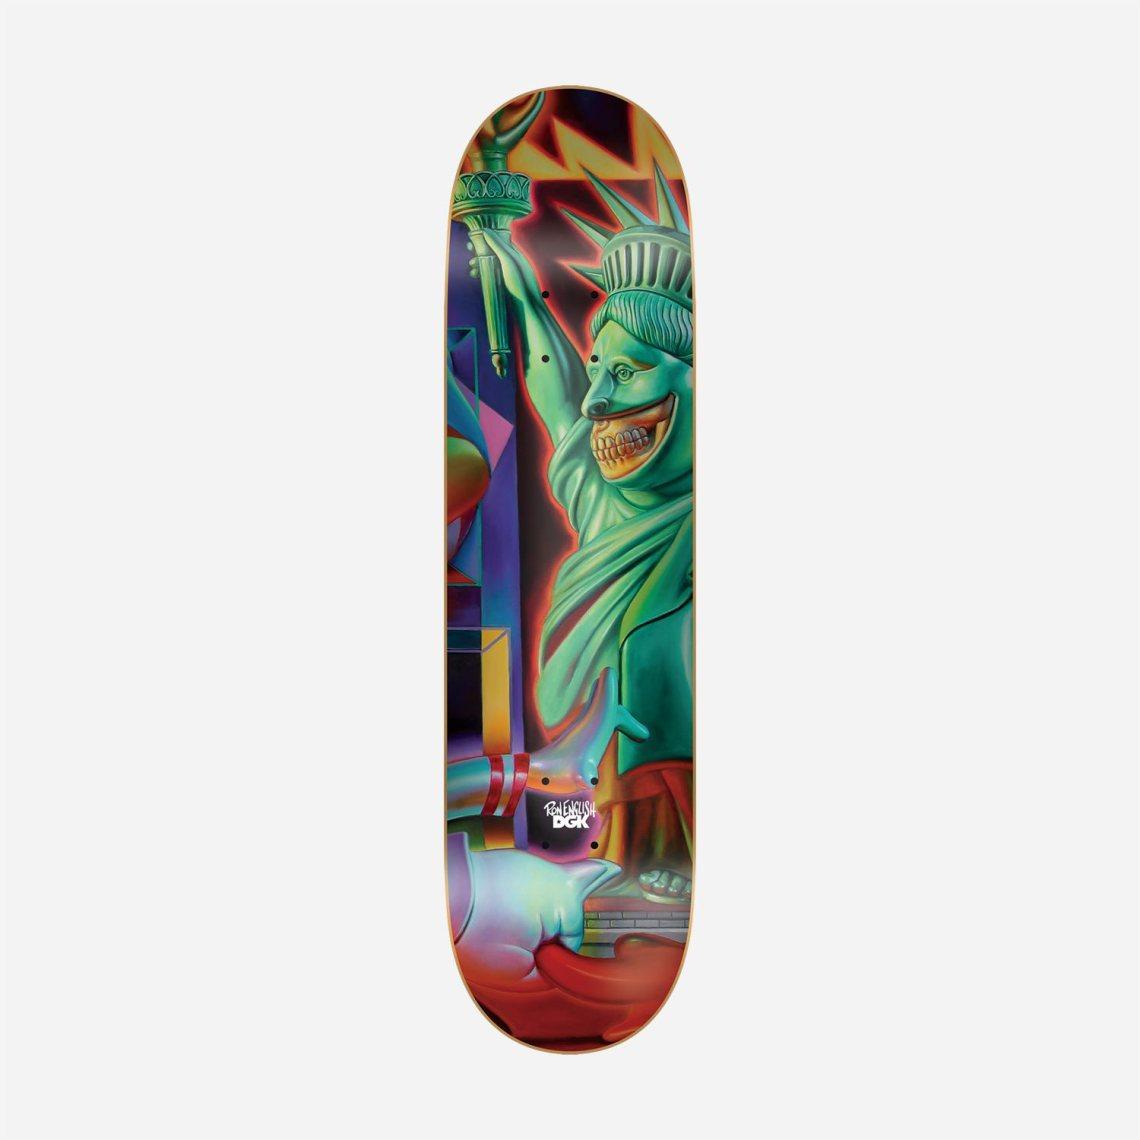 Ron English Dgk Skateboards Series 8